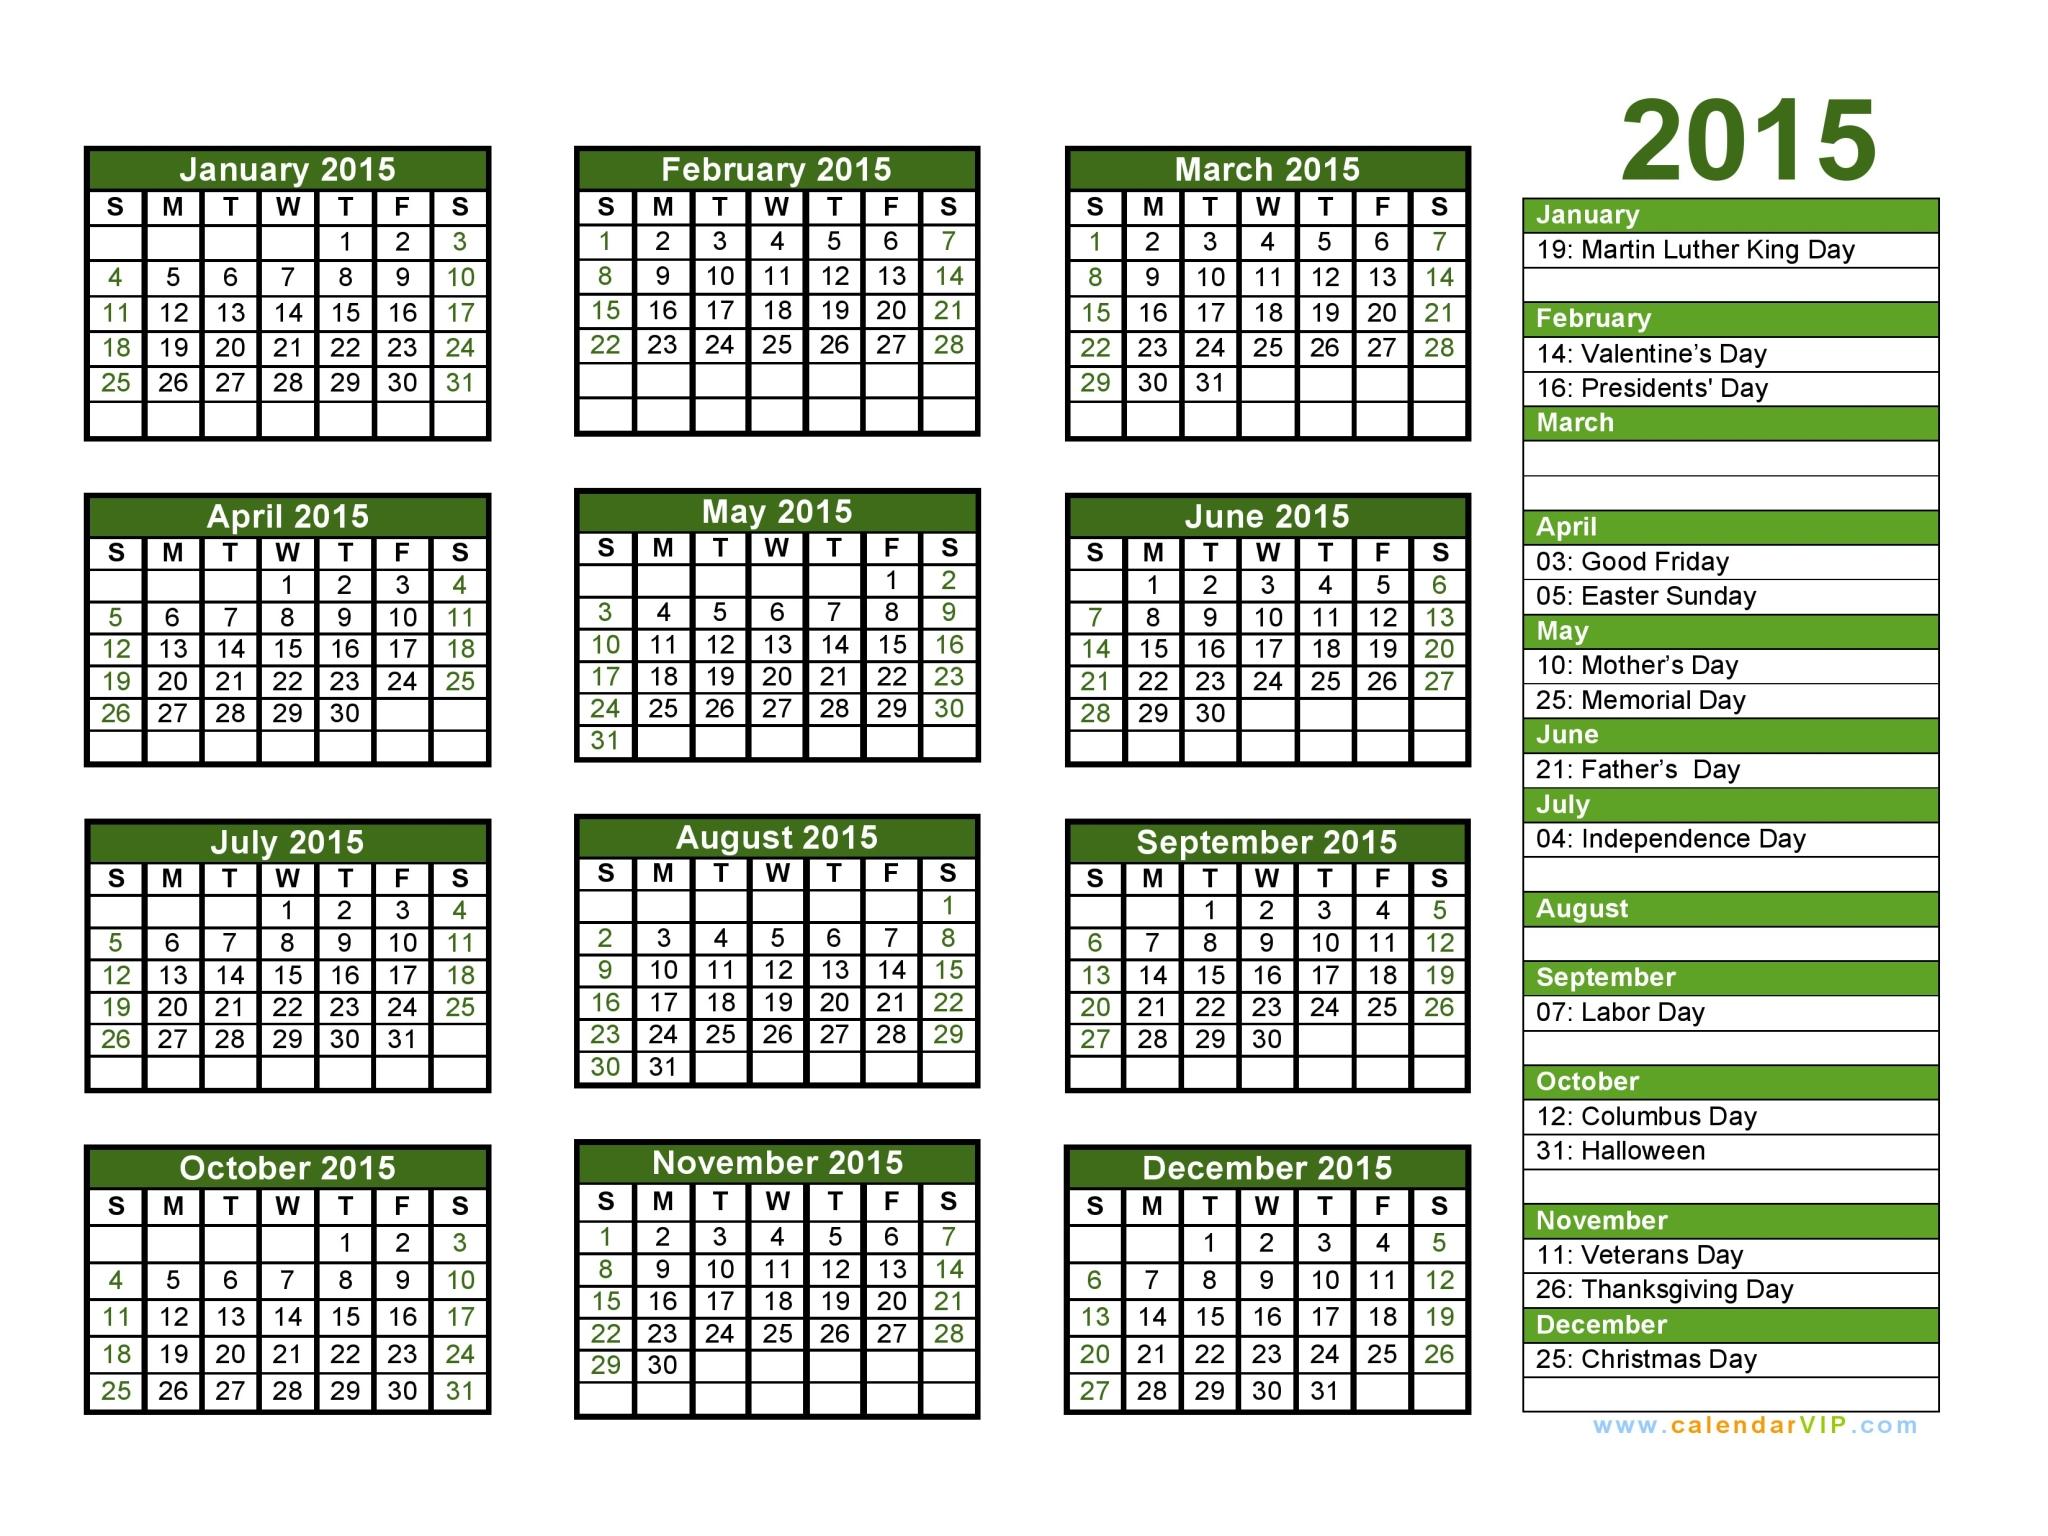 From wincalendar.com dec 2014 january 2015 feb 2015 sun mon tue wed thu fri sat 1 2 3 4 5 6 7 8 9 10 11 12 13 14 15 2015 Calendar Blank Printable Calendar Template In Pdf Word Excel